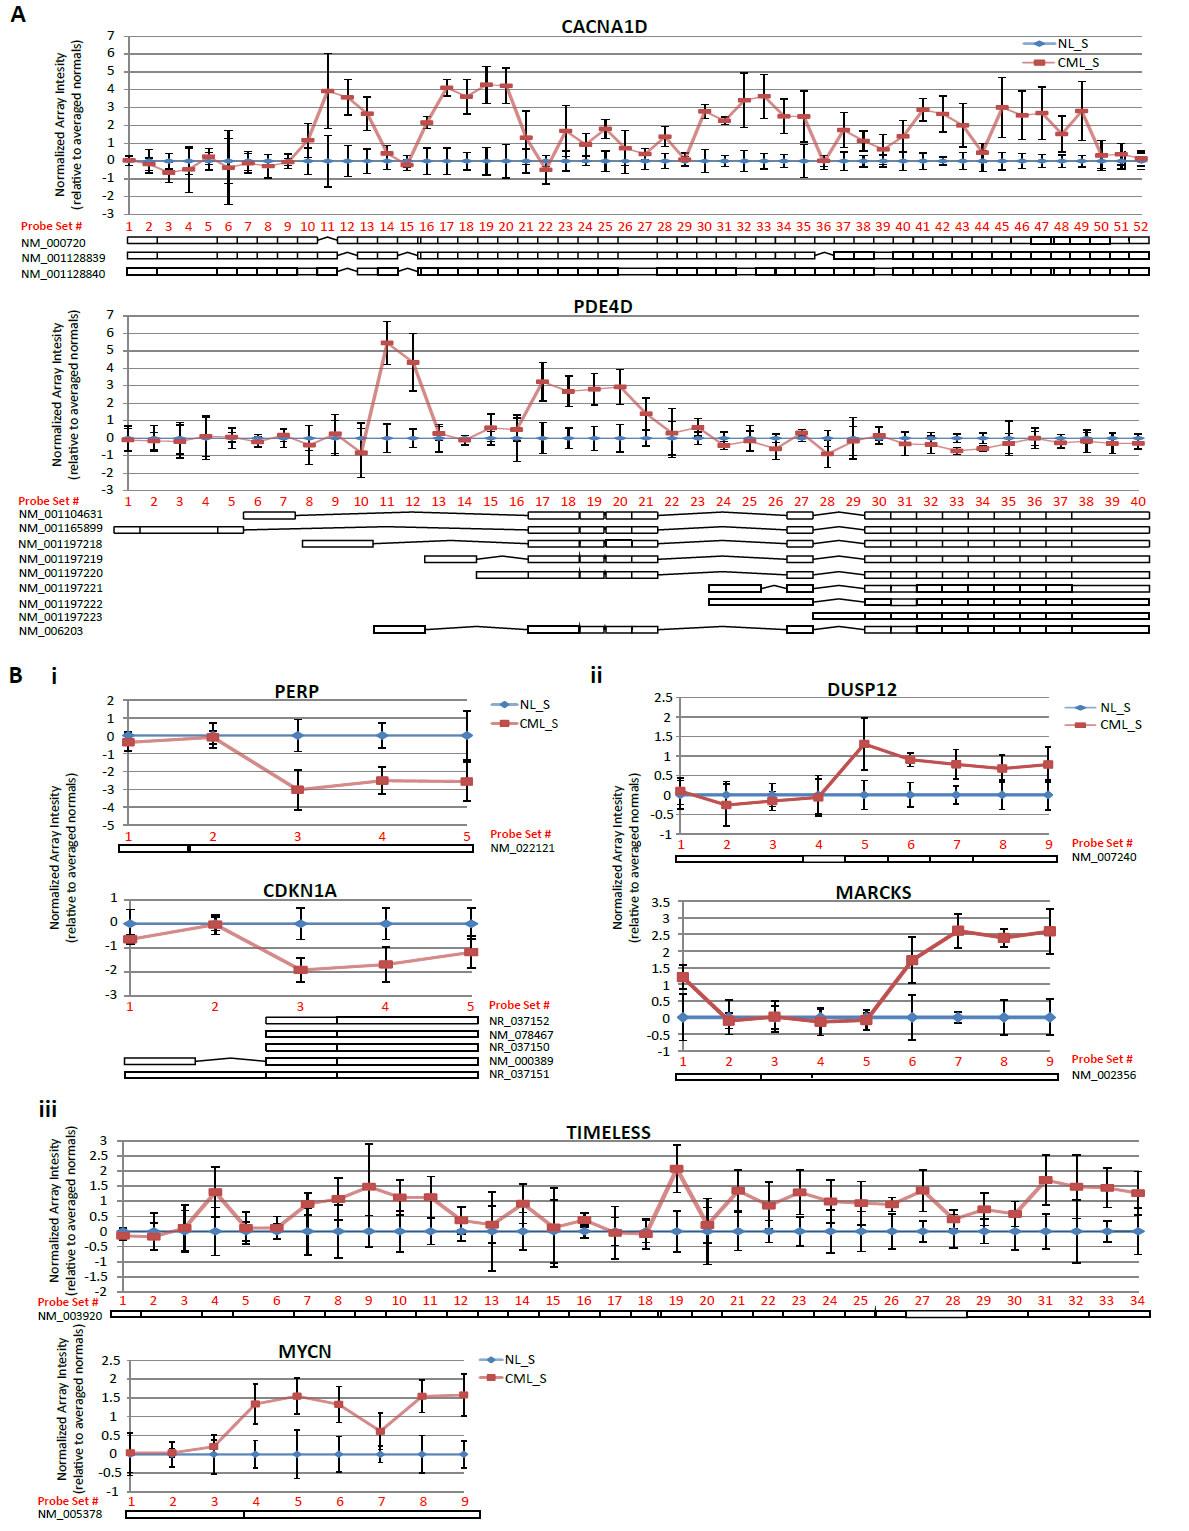 Exon-level analysis reveals evidence of alternative splicing in CML LSCs.